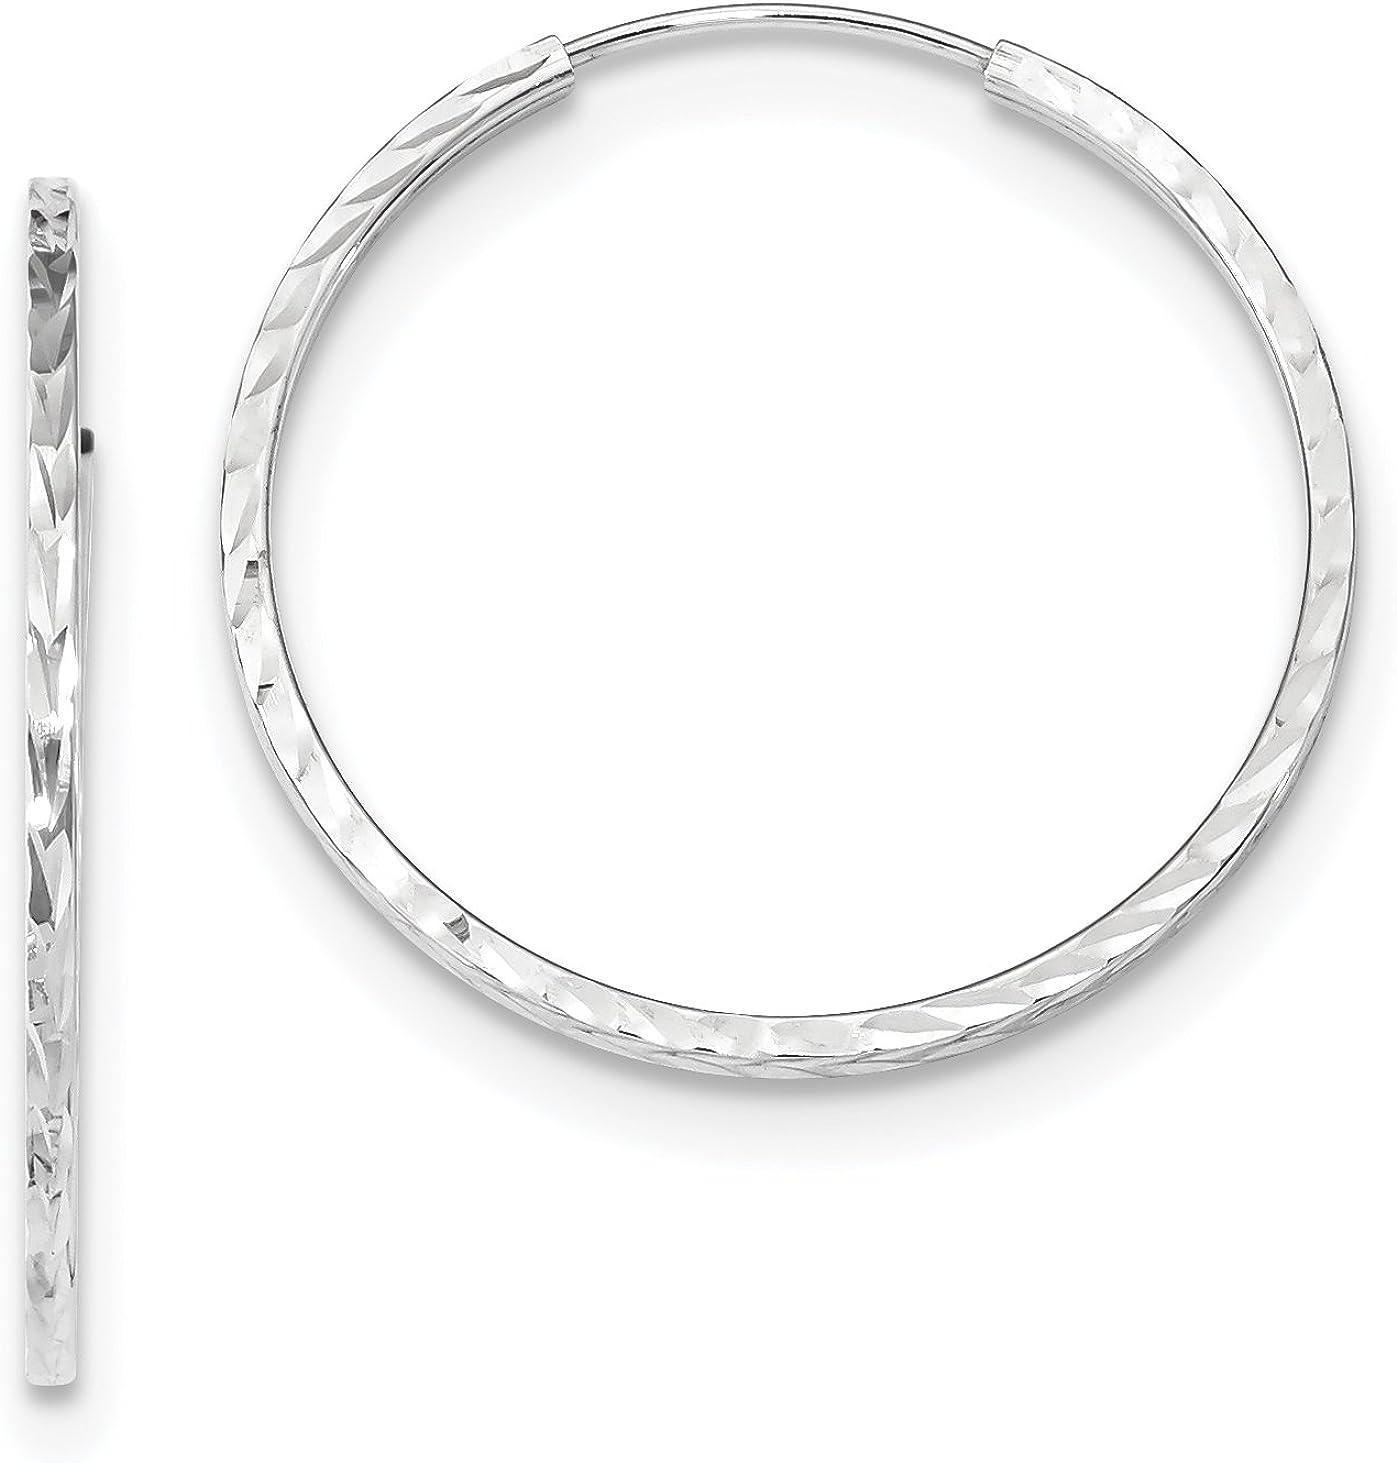 14K White Gold Polished Diamond Cut 30mm Endless Hoop Earrings